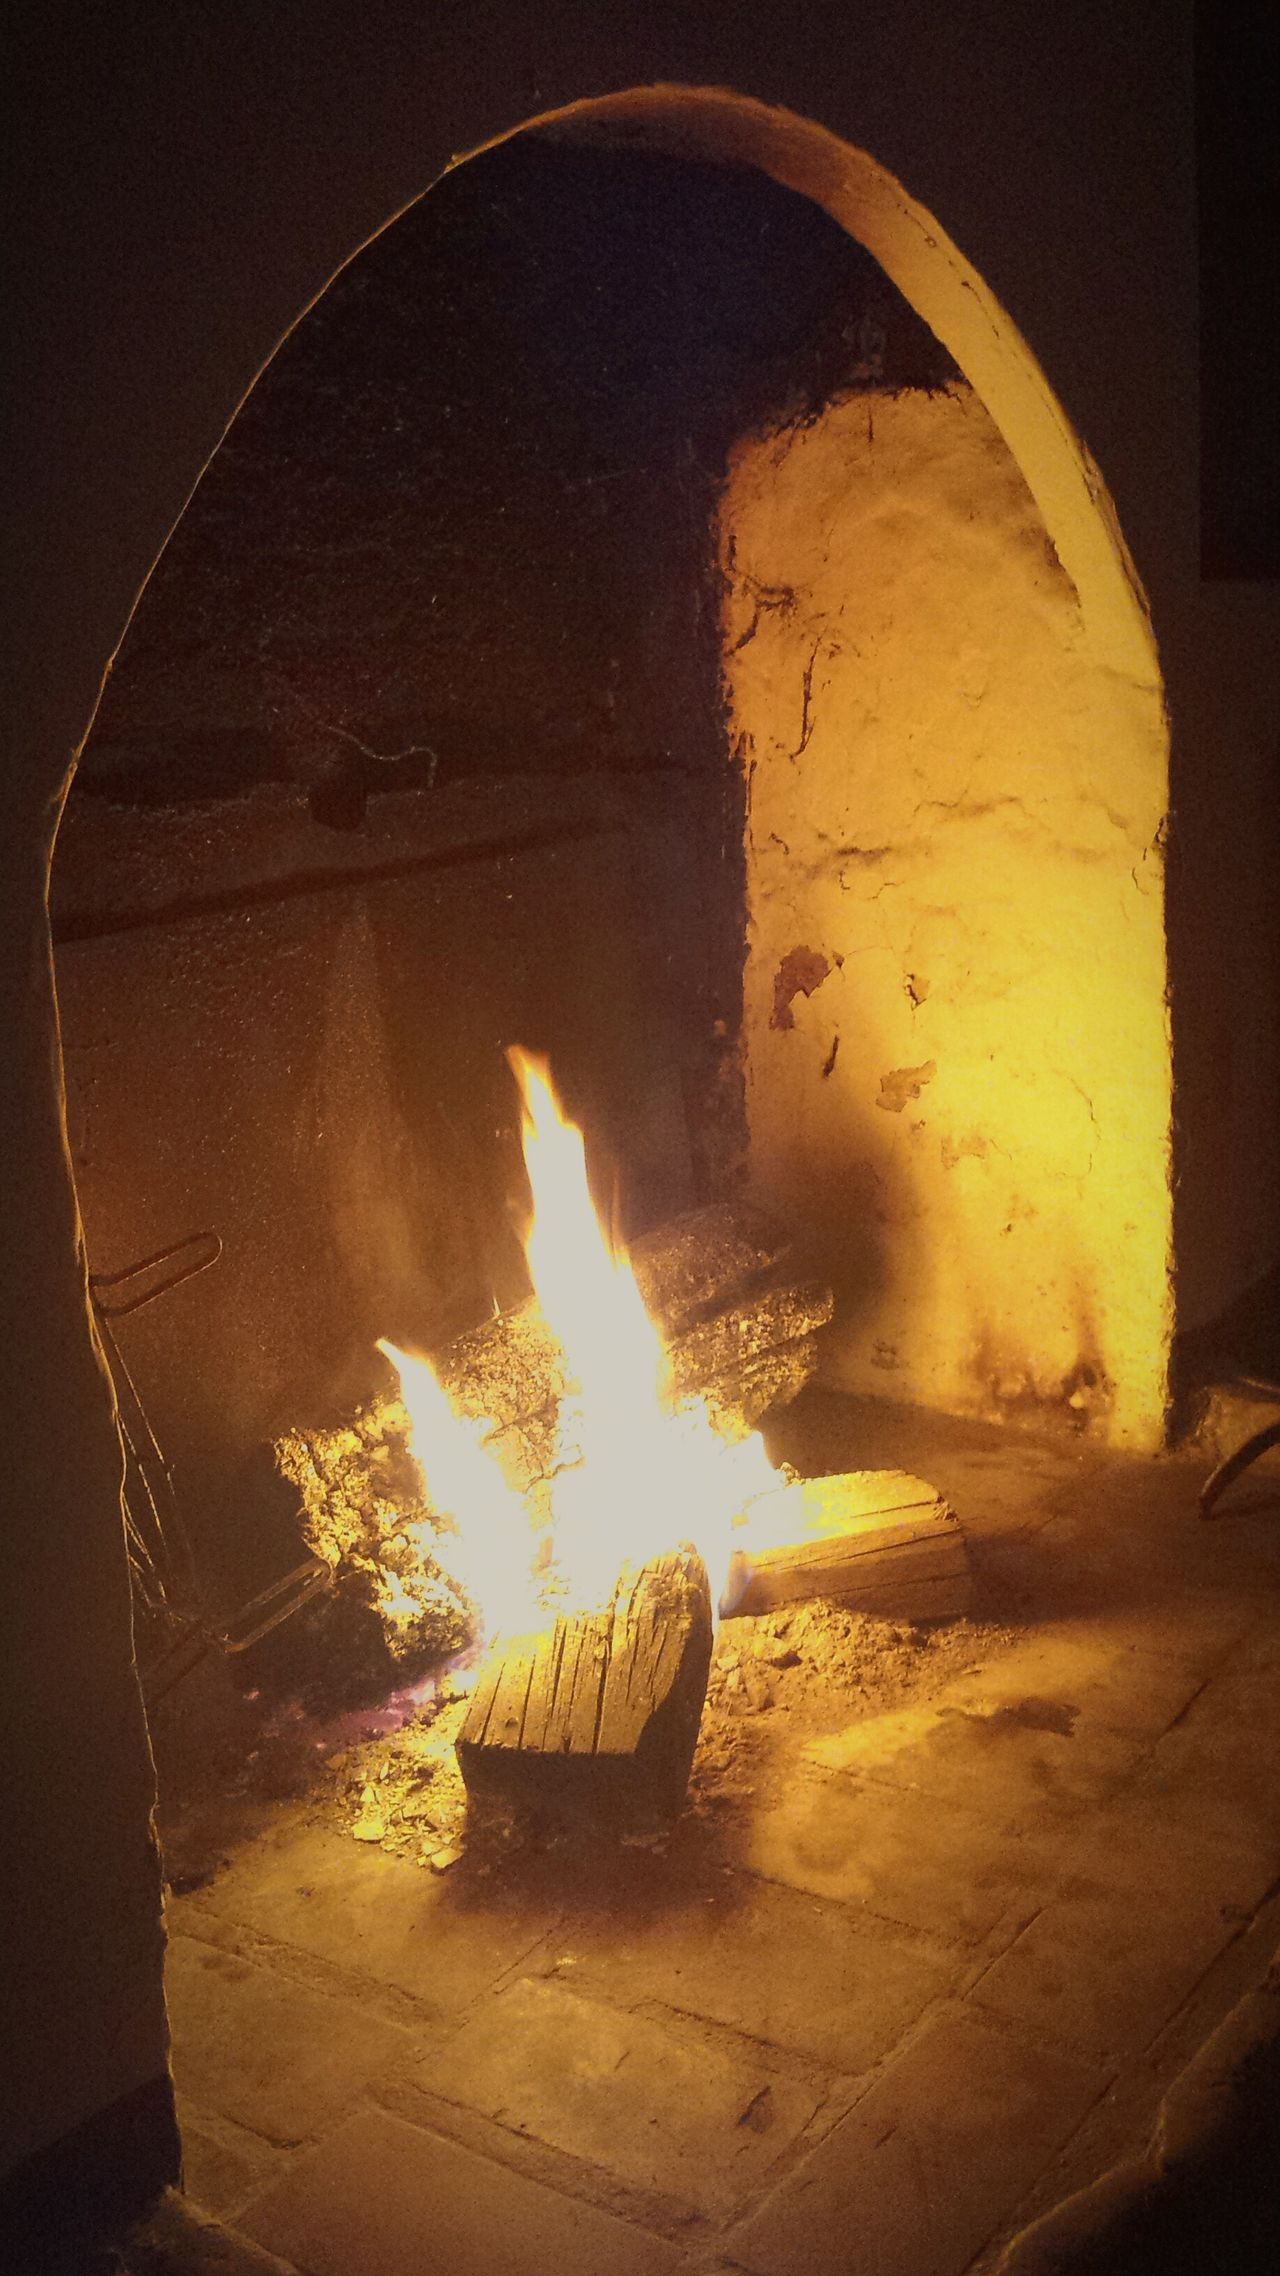 El descanso del pastor.... Flame Illuminated TrashumanciaJaén Trashumancia Pastores Pastores Sierra Segura Sierra Morena Linares Patrimonio Etnológico Patrimonio Cultural